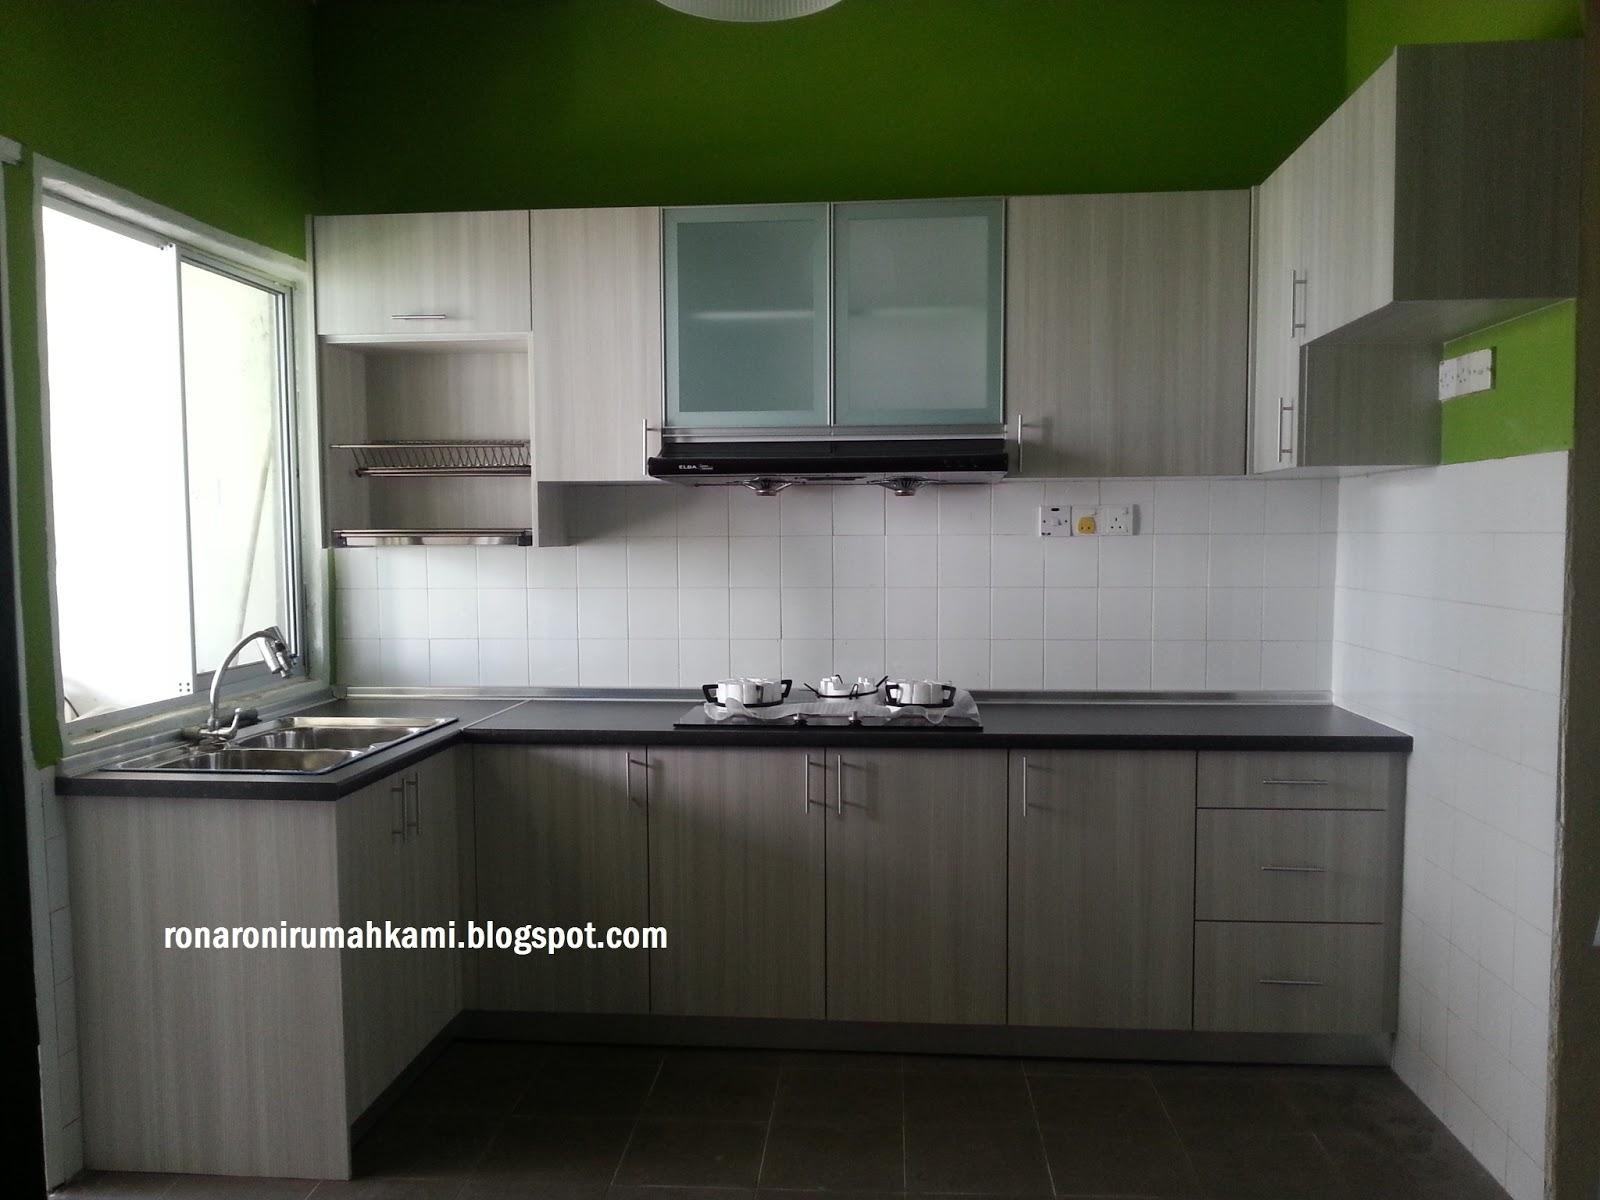 Ronaronirumahkami kabinet dapur dengan sunshine kitchen for Kitchen dapur